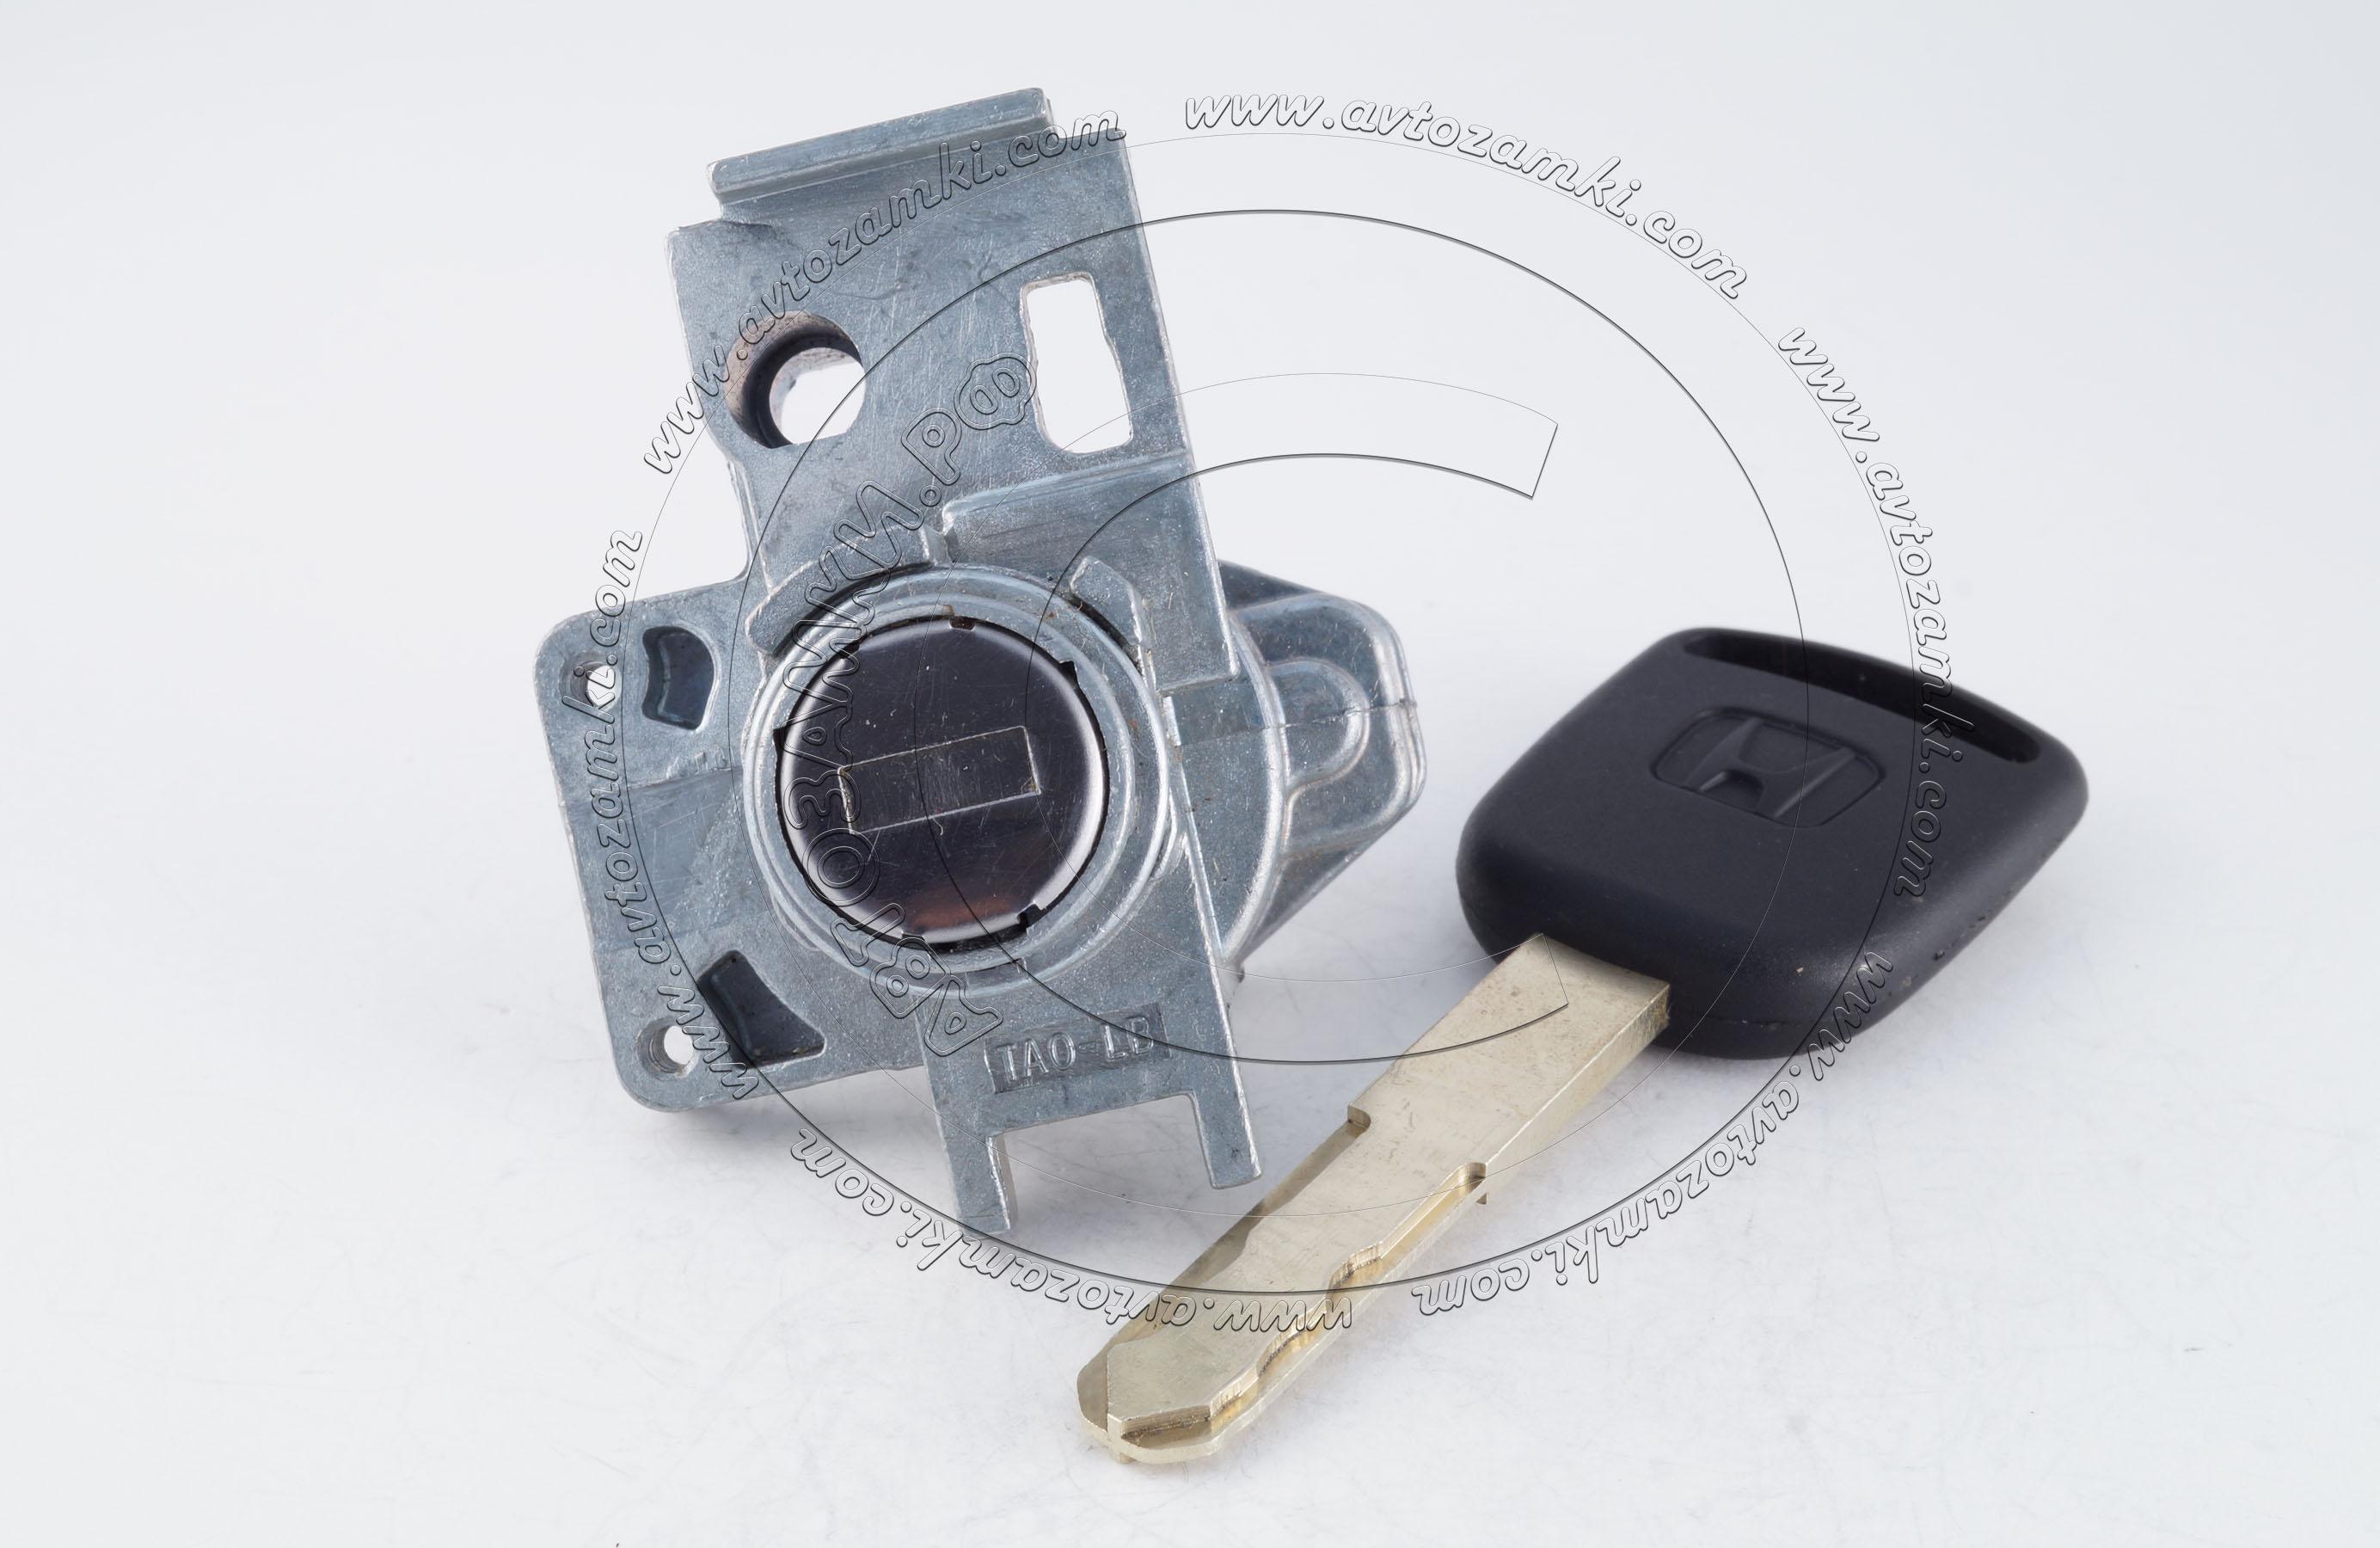 Замена замка зажигания хонда аккорд 8 Замер компрессии мазда бонго